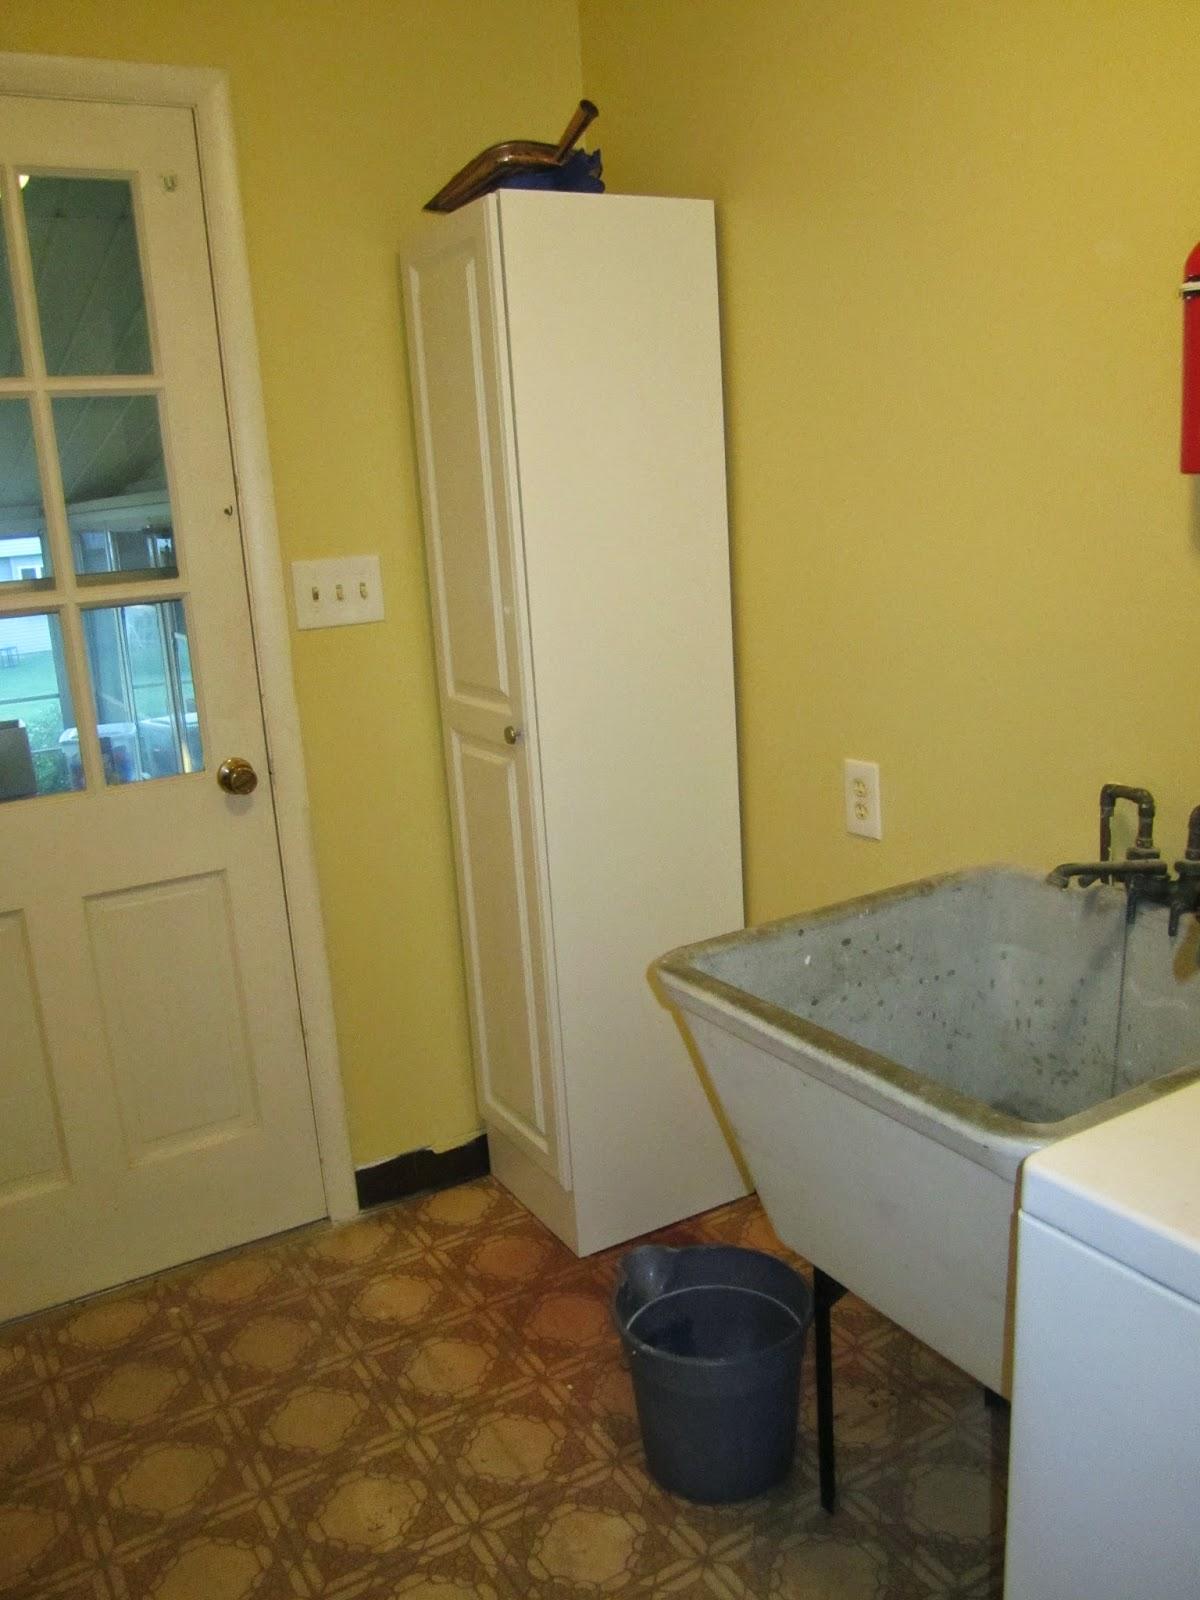 Organizing for Six: Organized Laundry Room